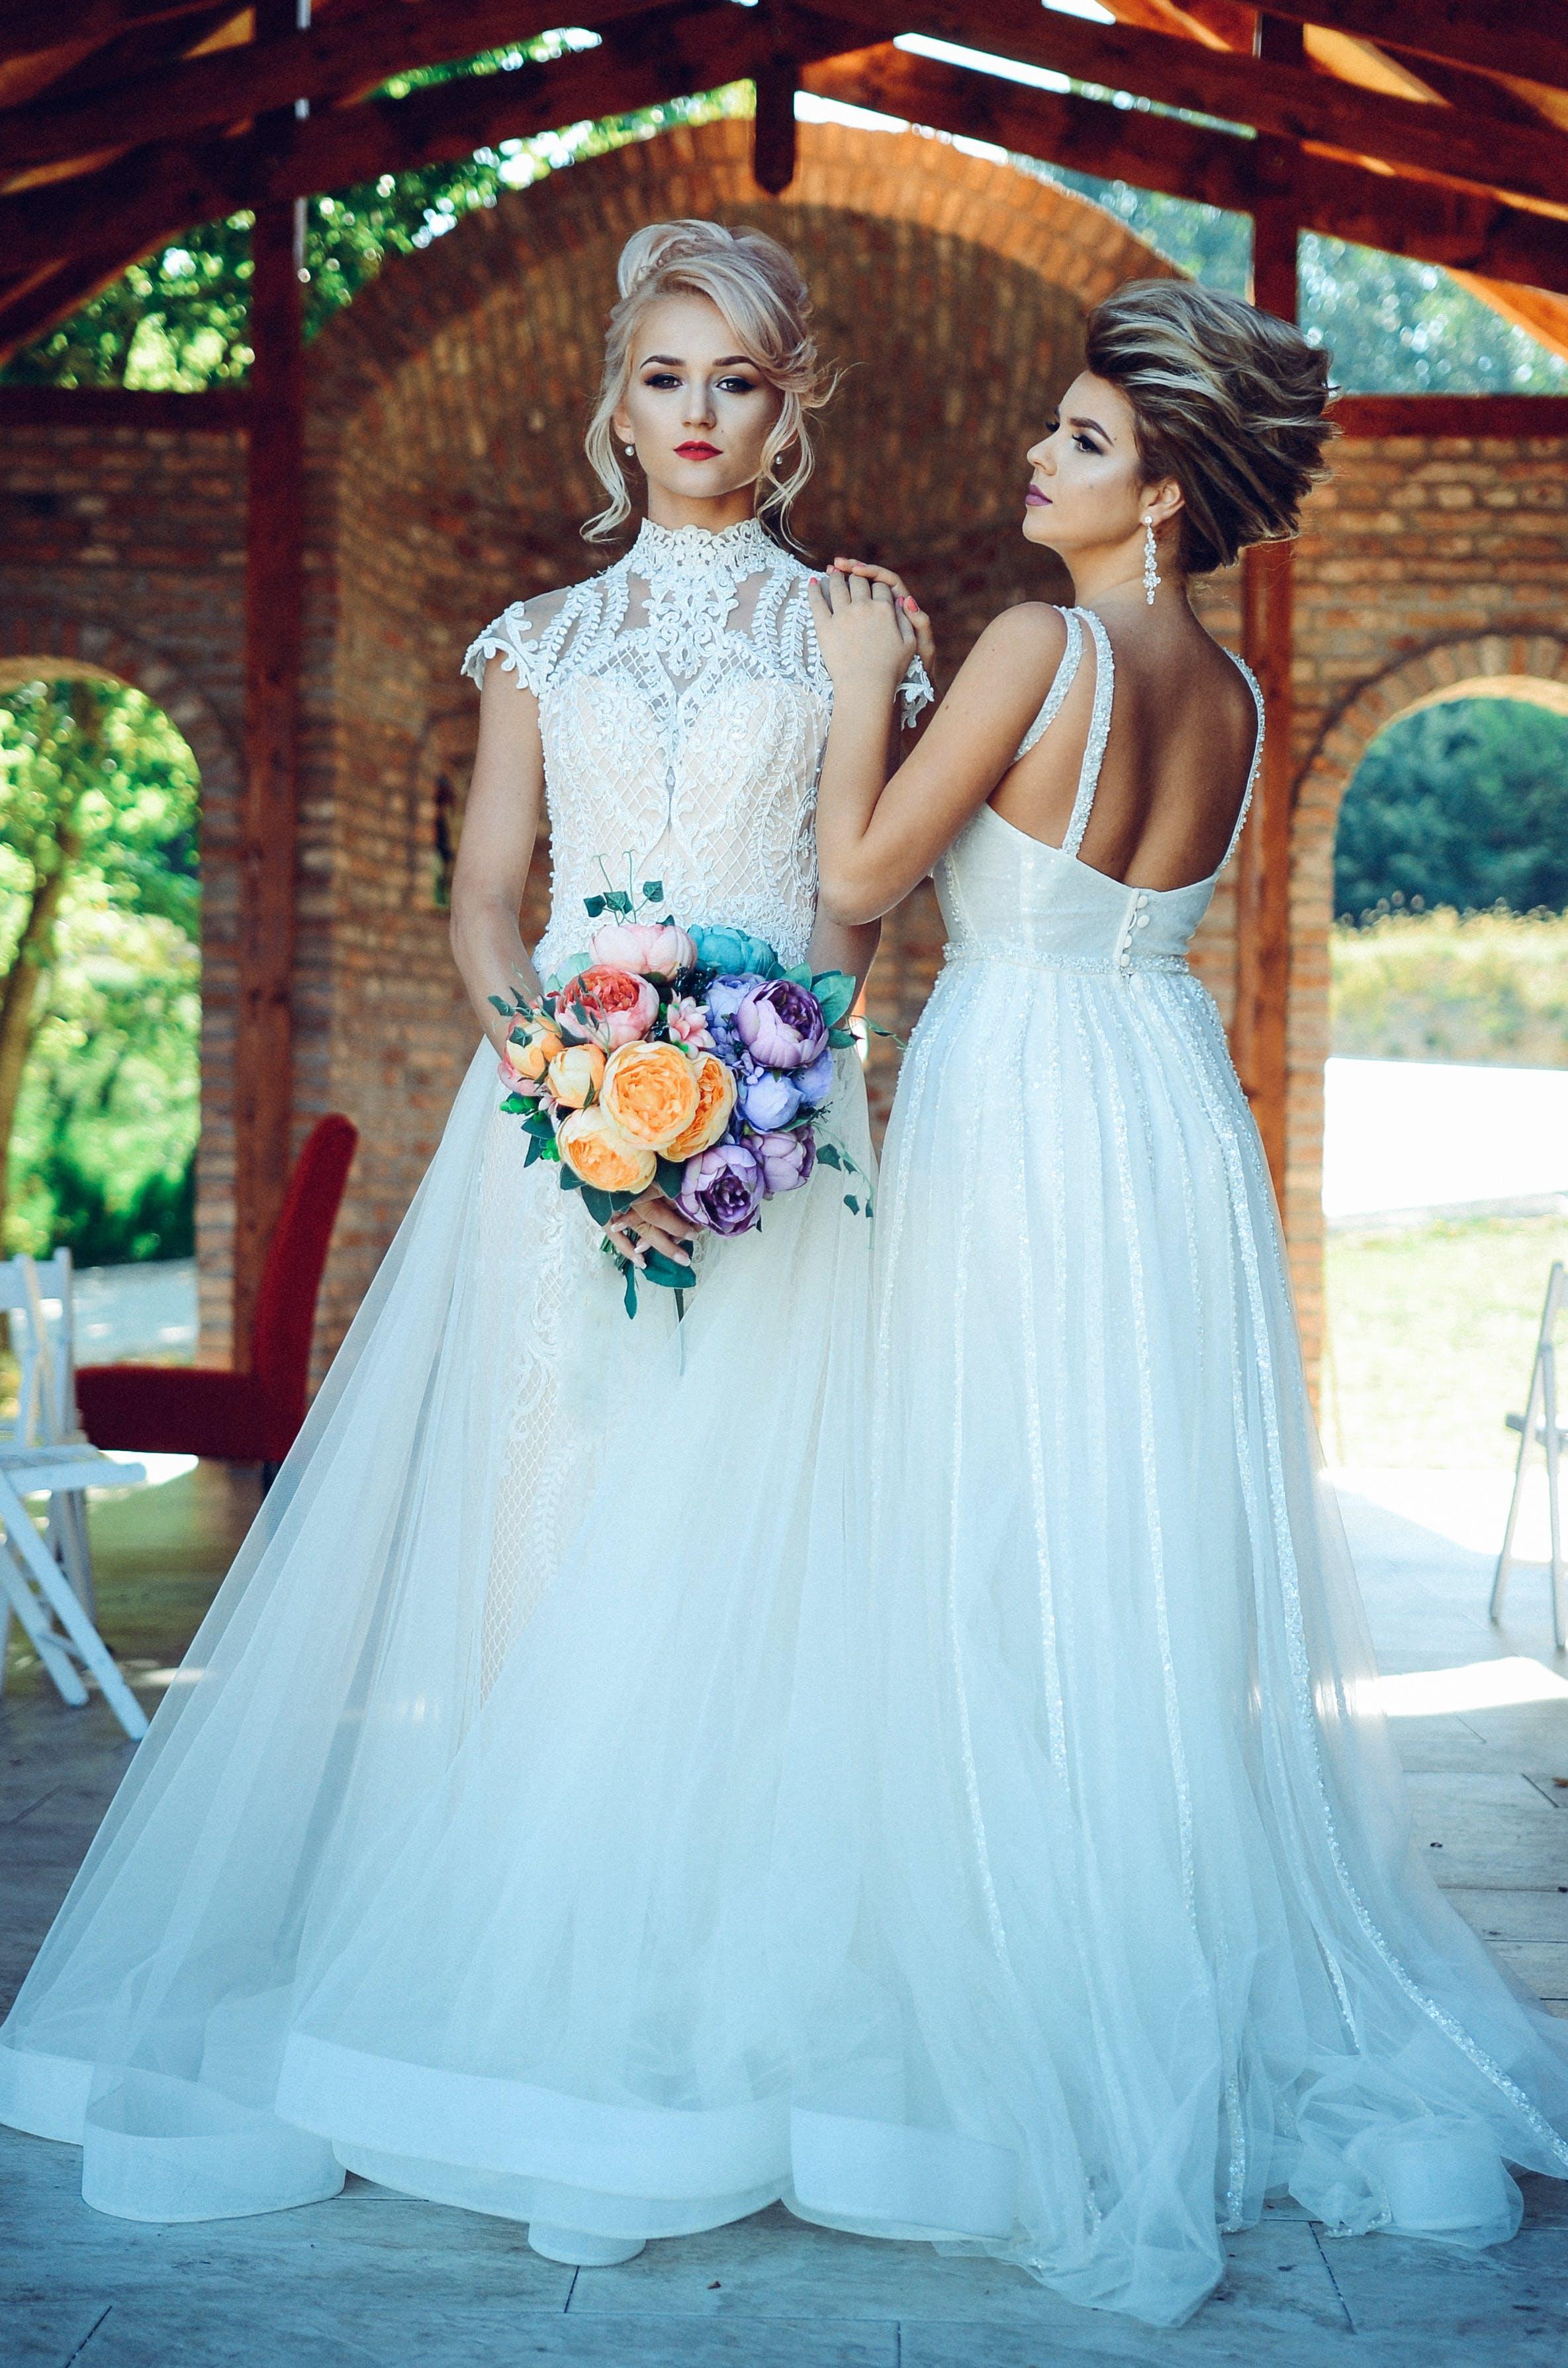 Woman in White Lace Wedding Dress Holding Flower Bouquet Beside Woman in White Dress